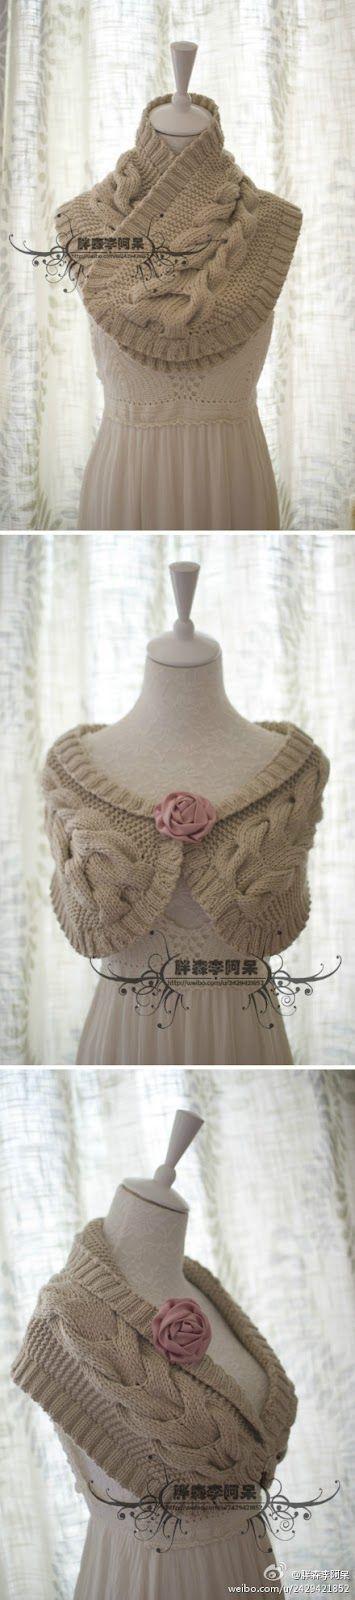 Brasil Tricô e Crochê - Handmade encomendas